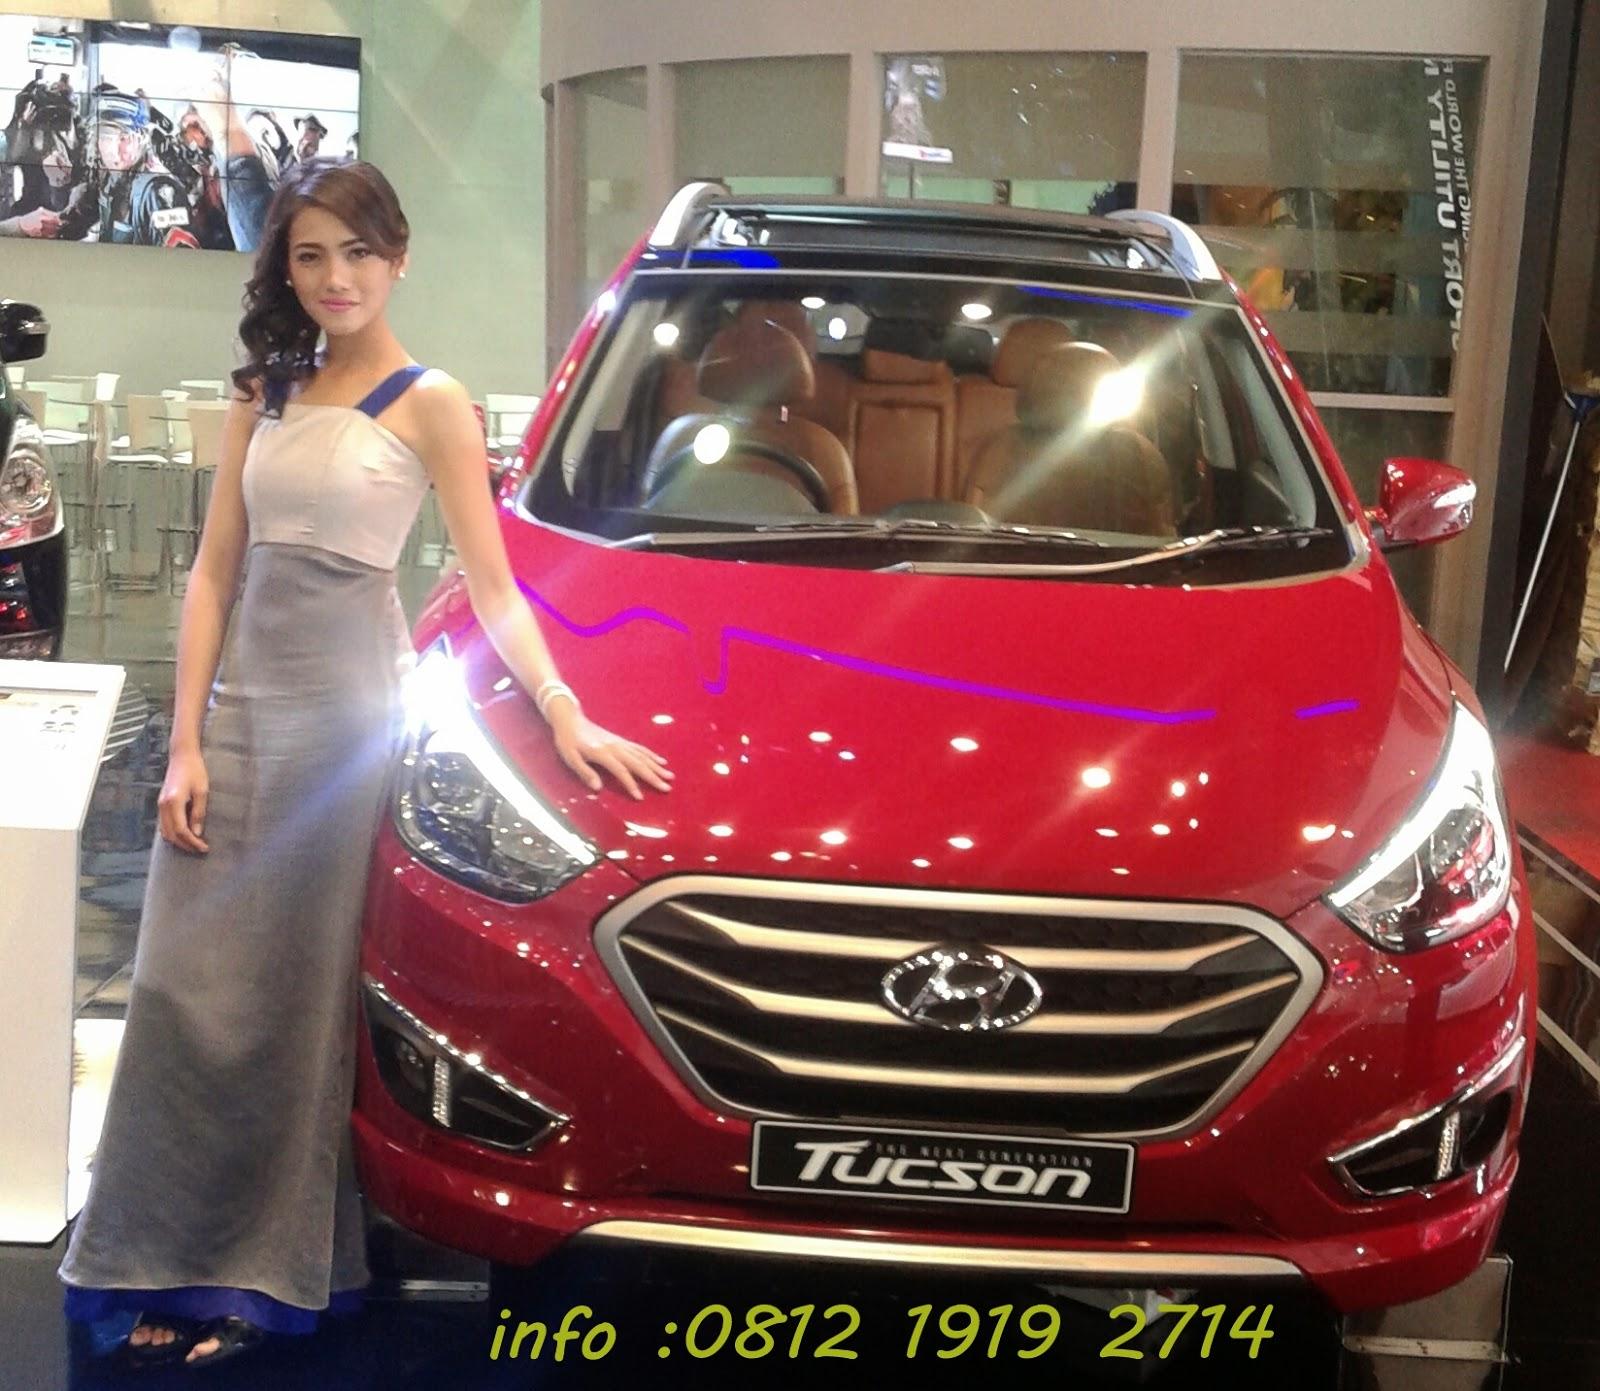 HYUNDAI TUCSON TERBARU 2014 ~ SUV GARANG NAN MEMPESONA